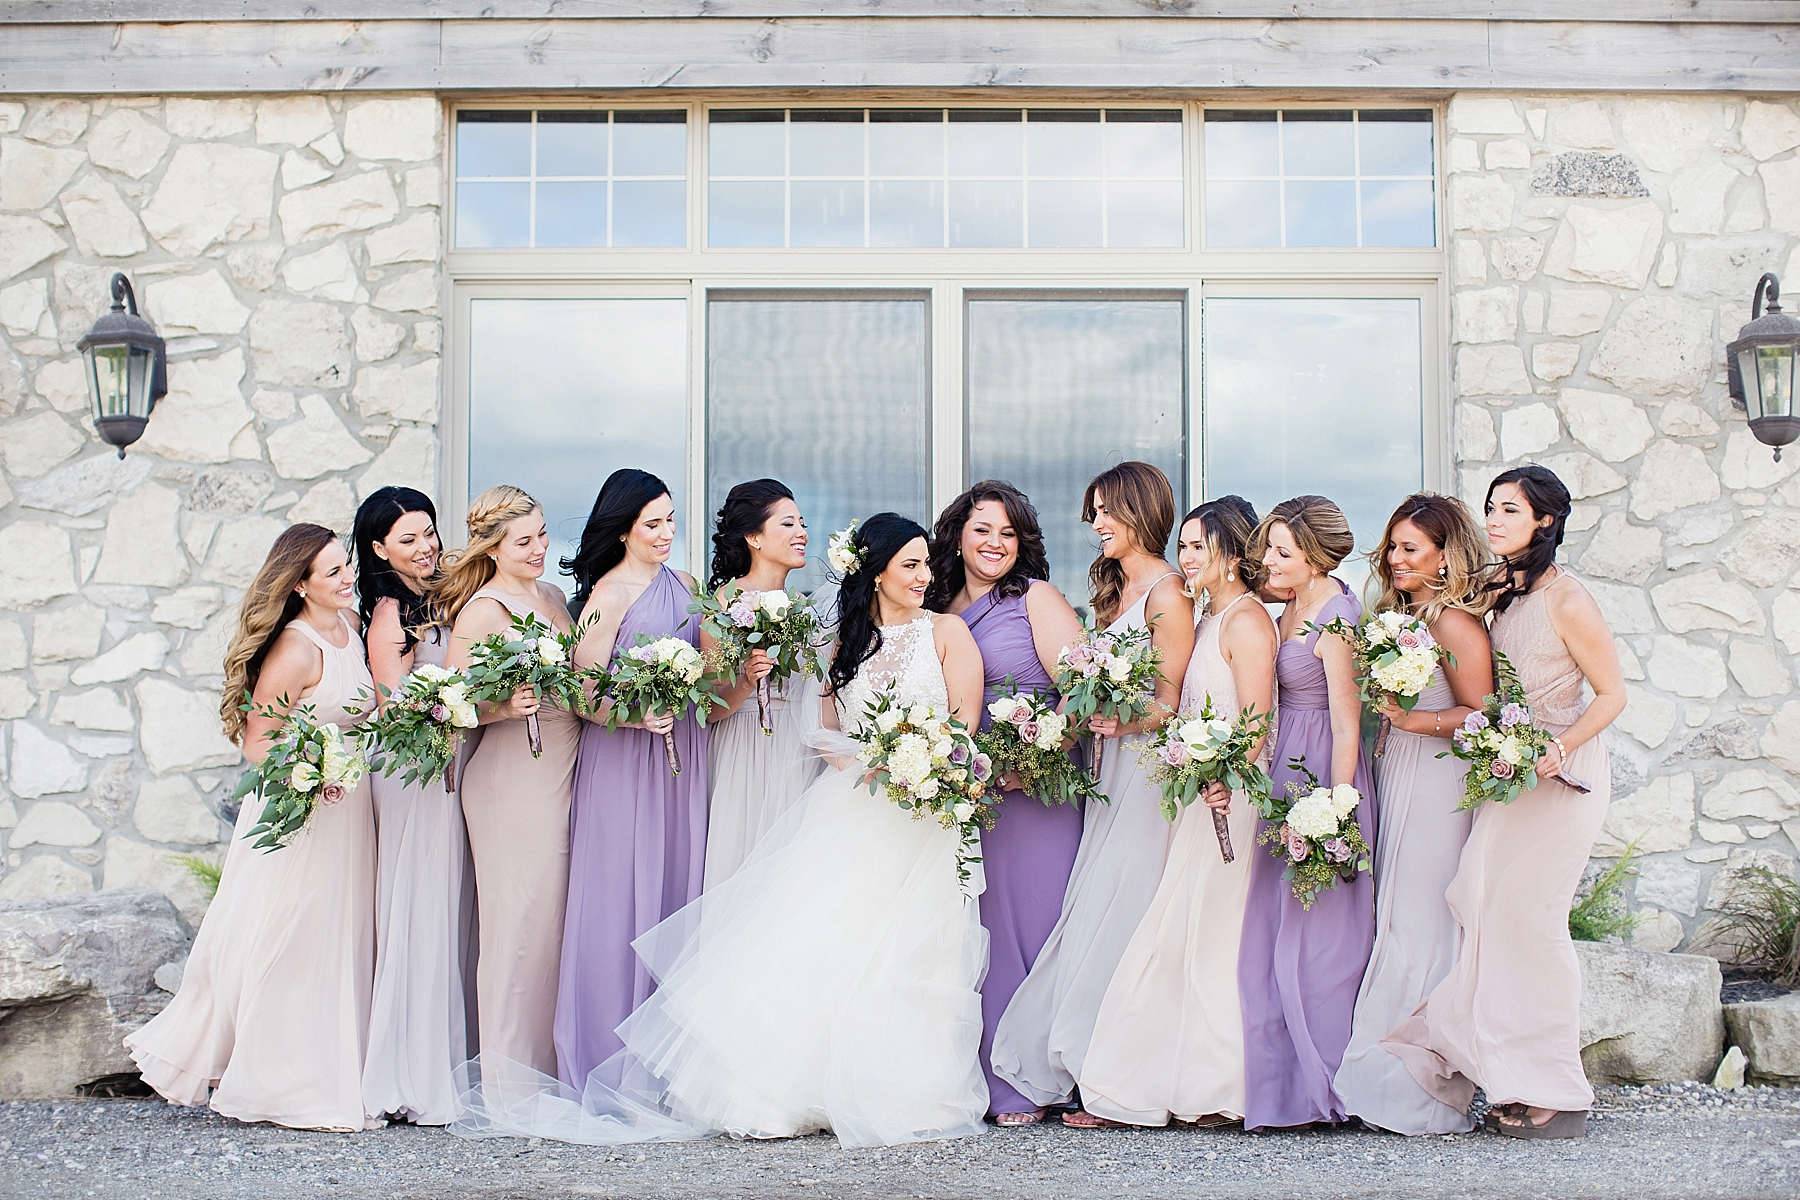 windsor-wedding-photographer-sprucewood-shores-winery-wedding-niagara-on-the-lake-wedding-photographer-eryn-shea-photography_0027.jpg